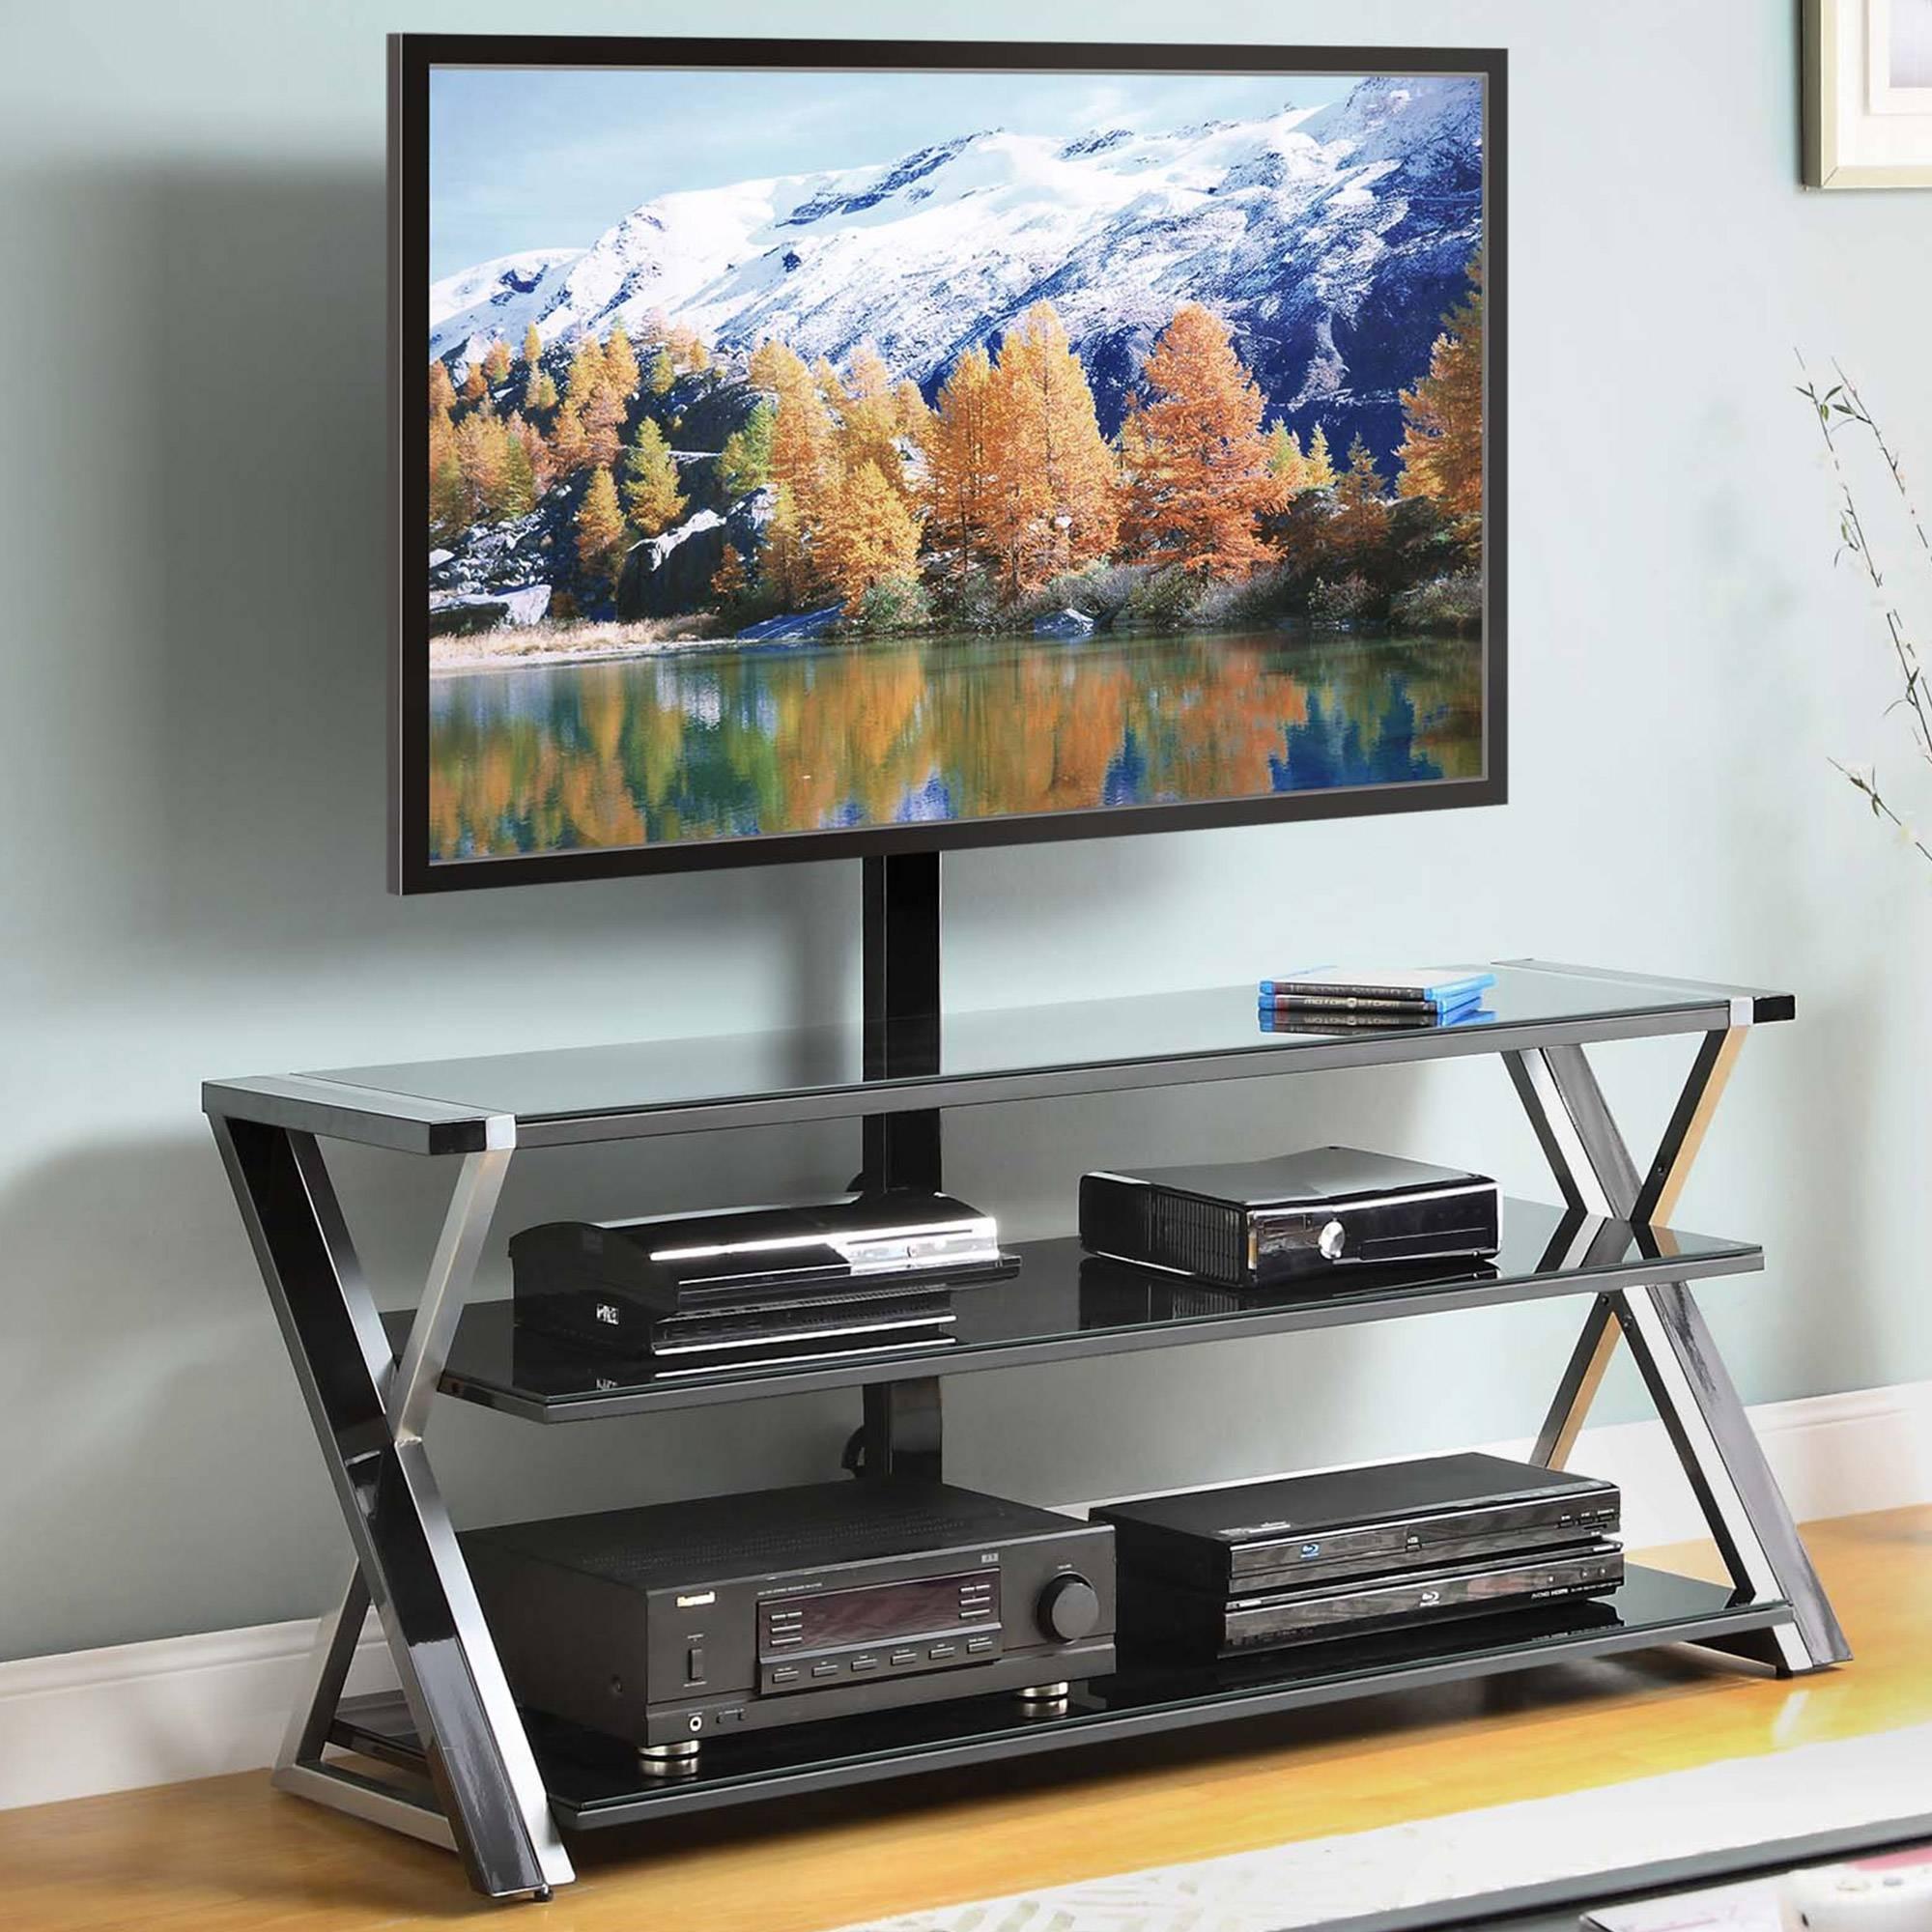 Tv Stands - Walmart regarding Tv Stands For Tube Tvs (Image 12 of 15)